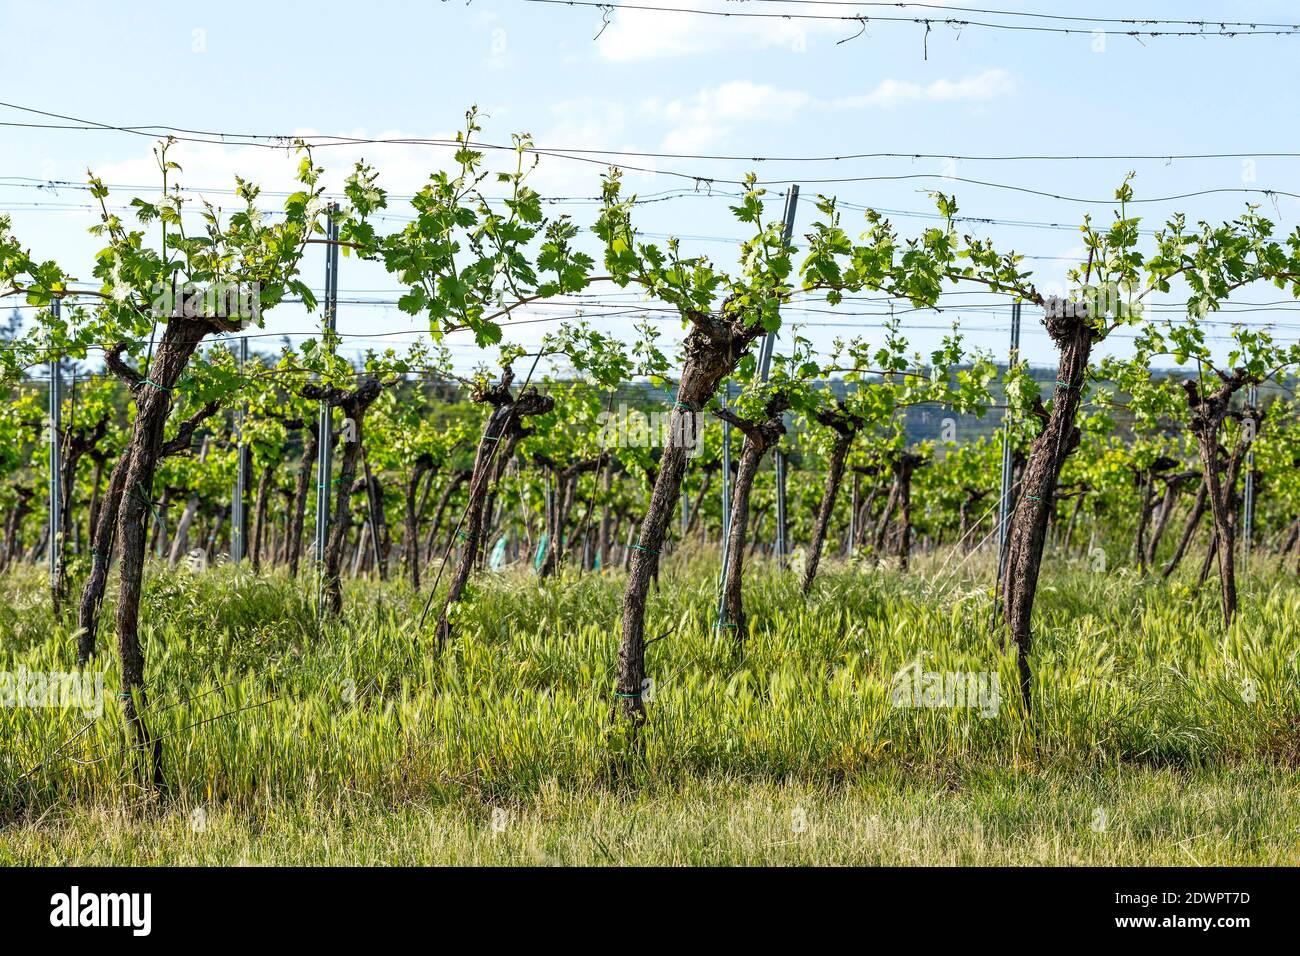 Weingarten im Frühling Stock Photo